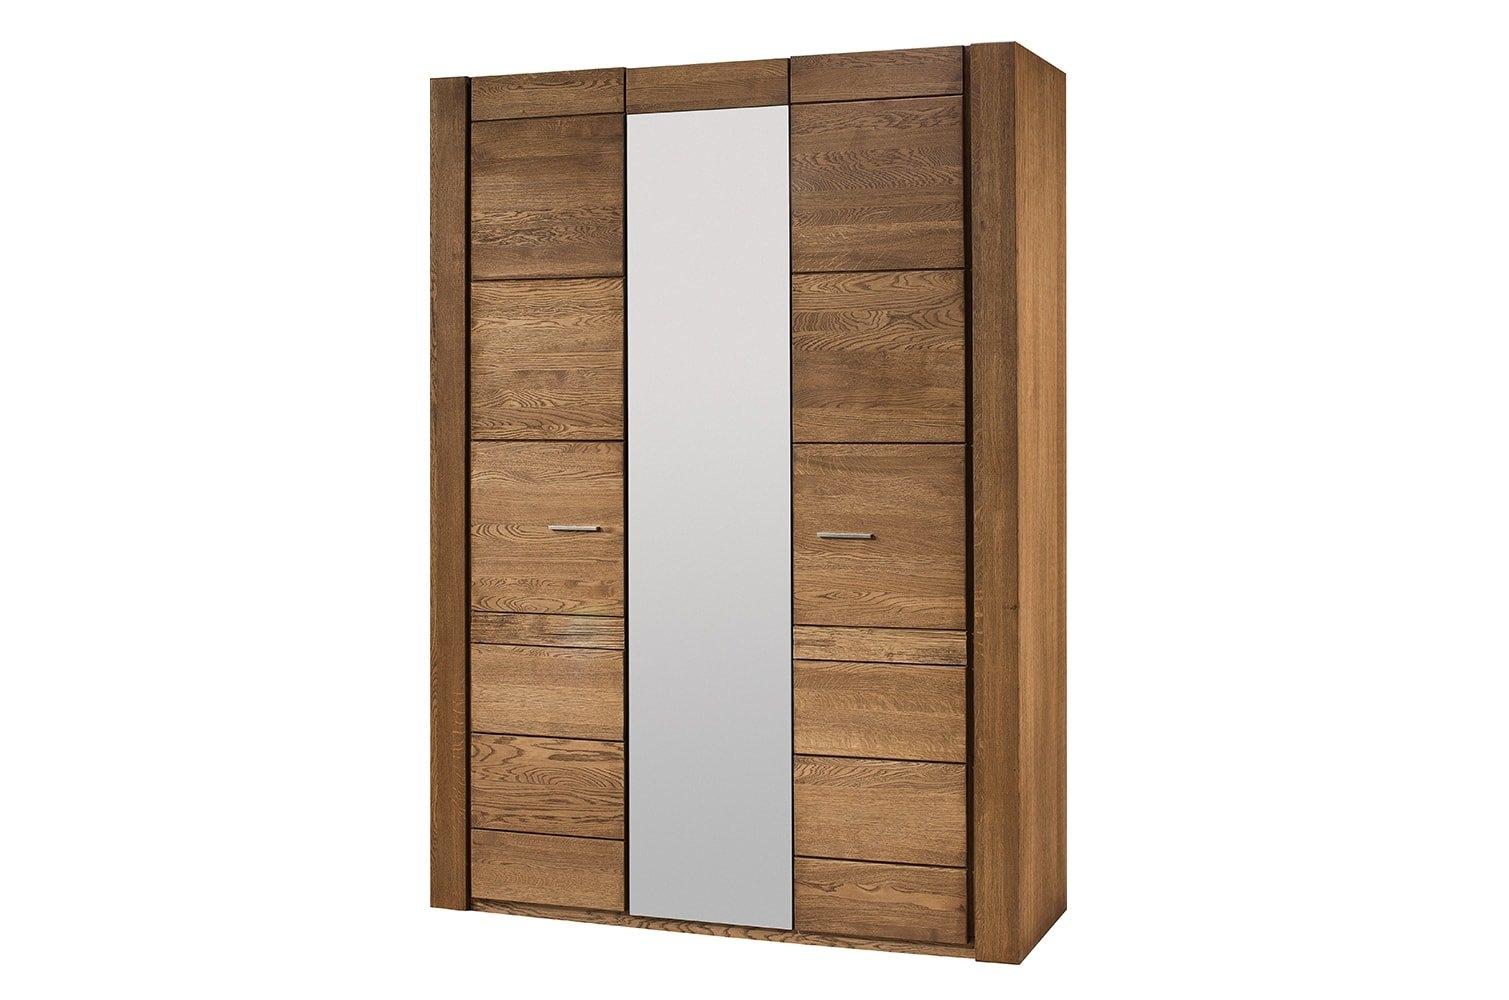 Dulap cu 3 usi si oglinda Velvet 73, l160xA60xH225 cm